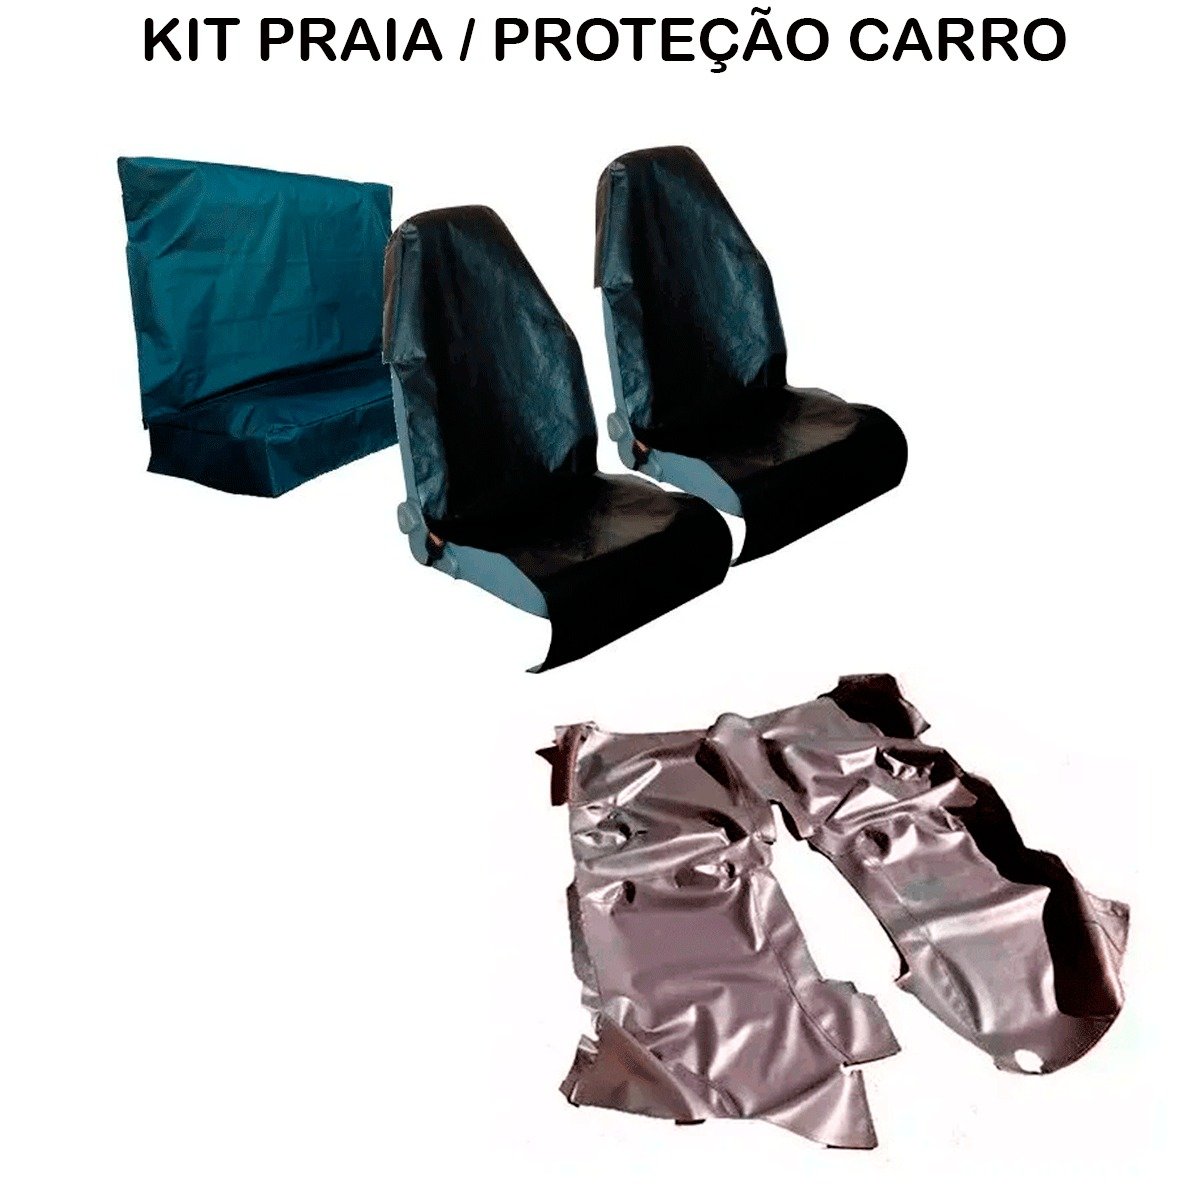 Tapete Em Vinil Volkswagen Voyage G6 + Capa Banco Protecao Banco Areia Suor Academia